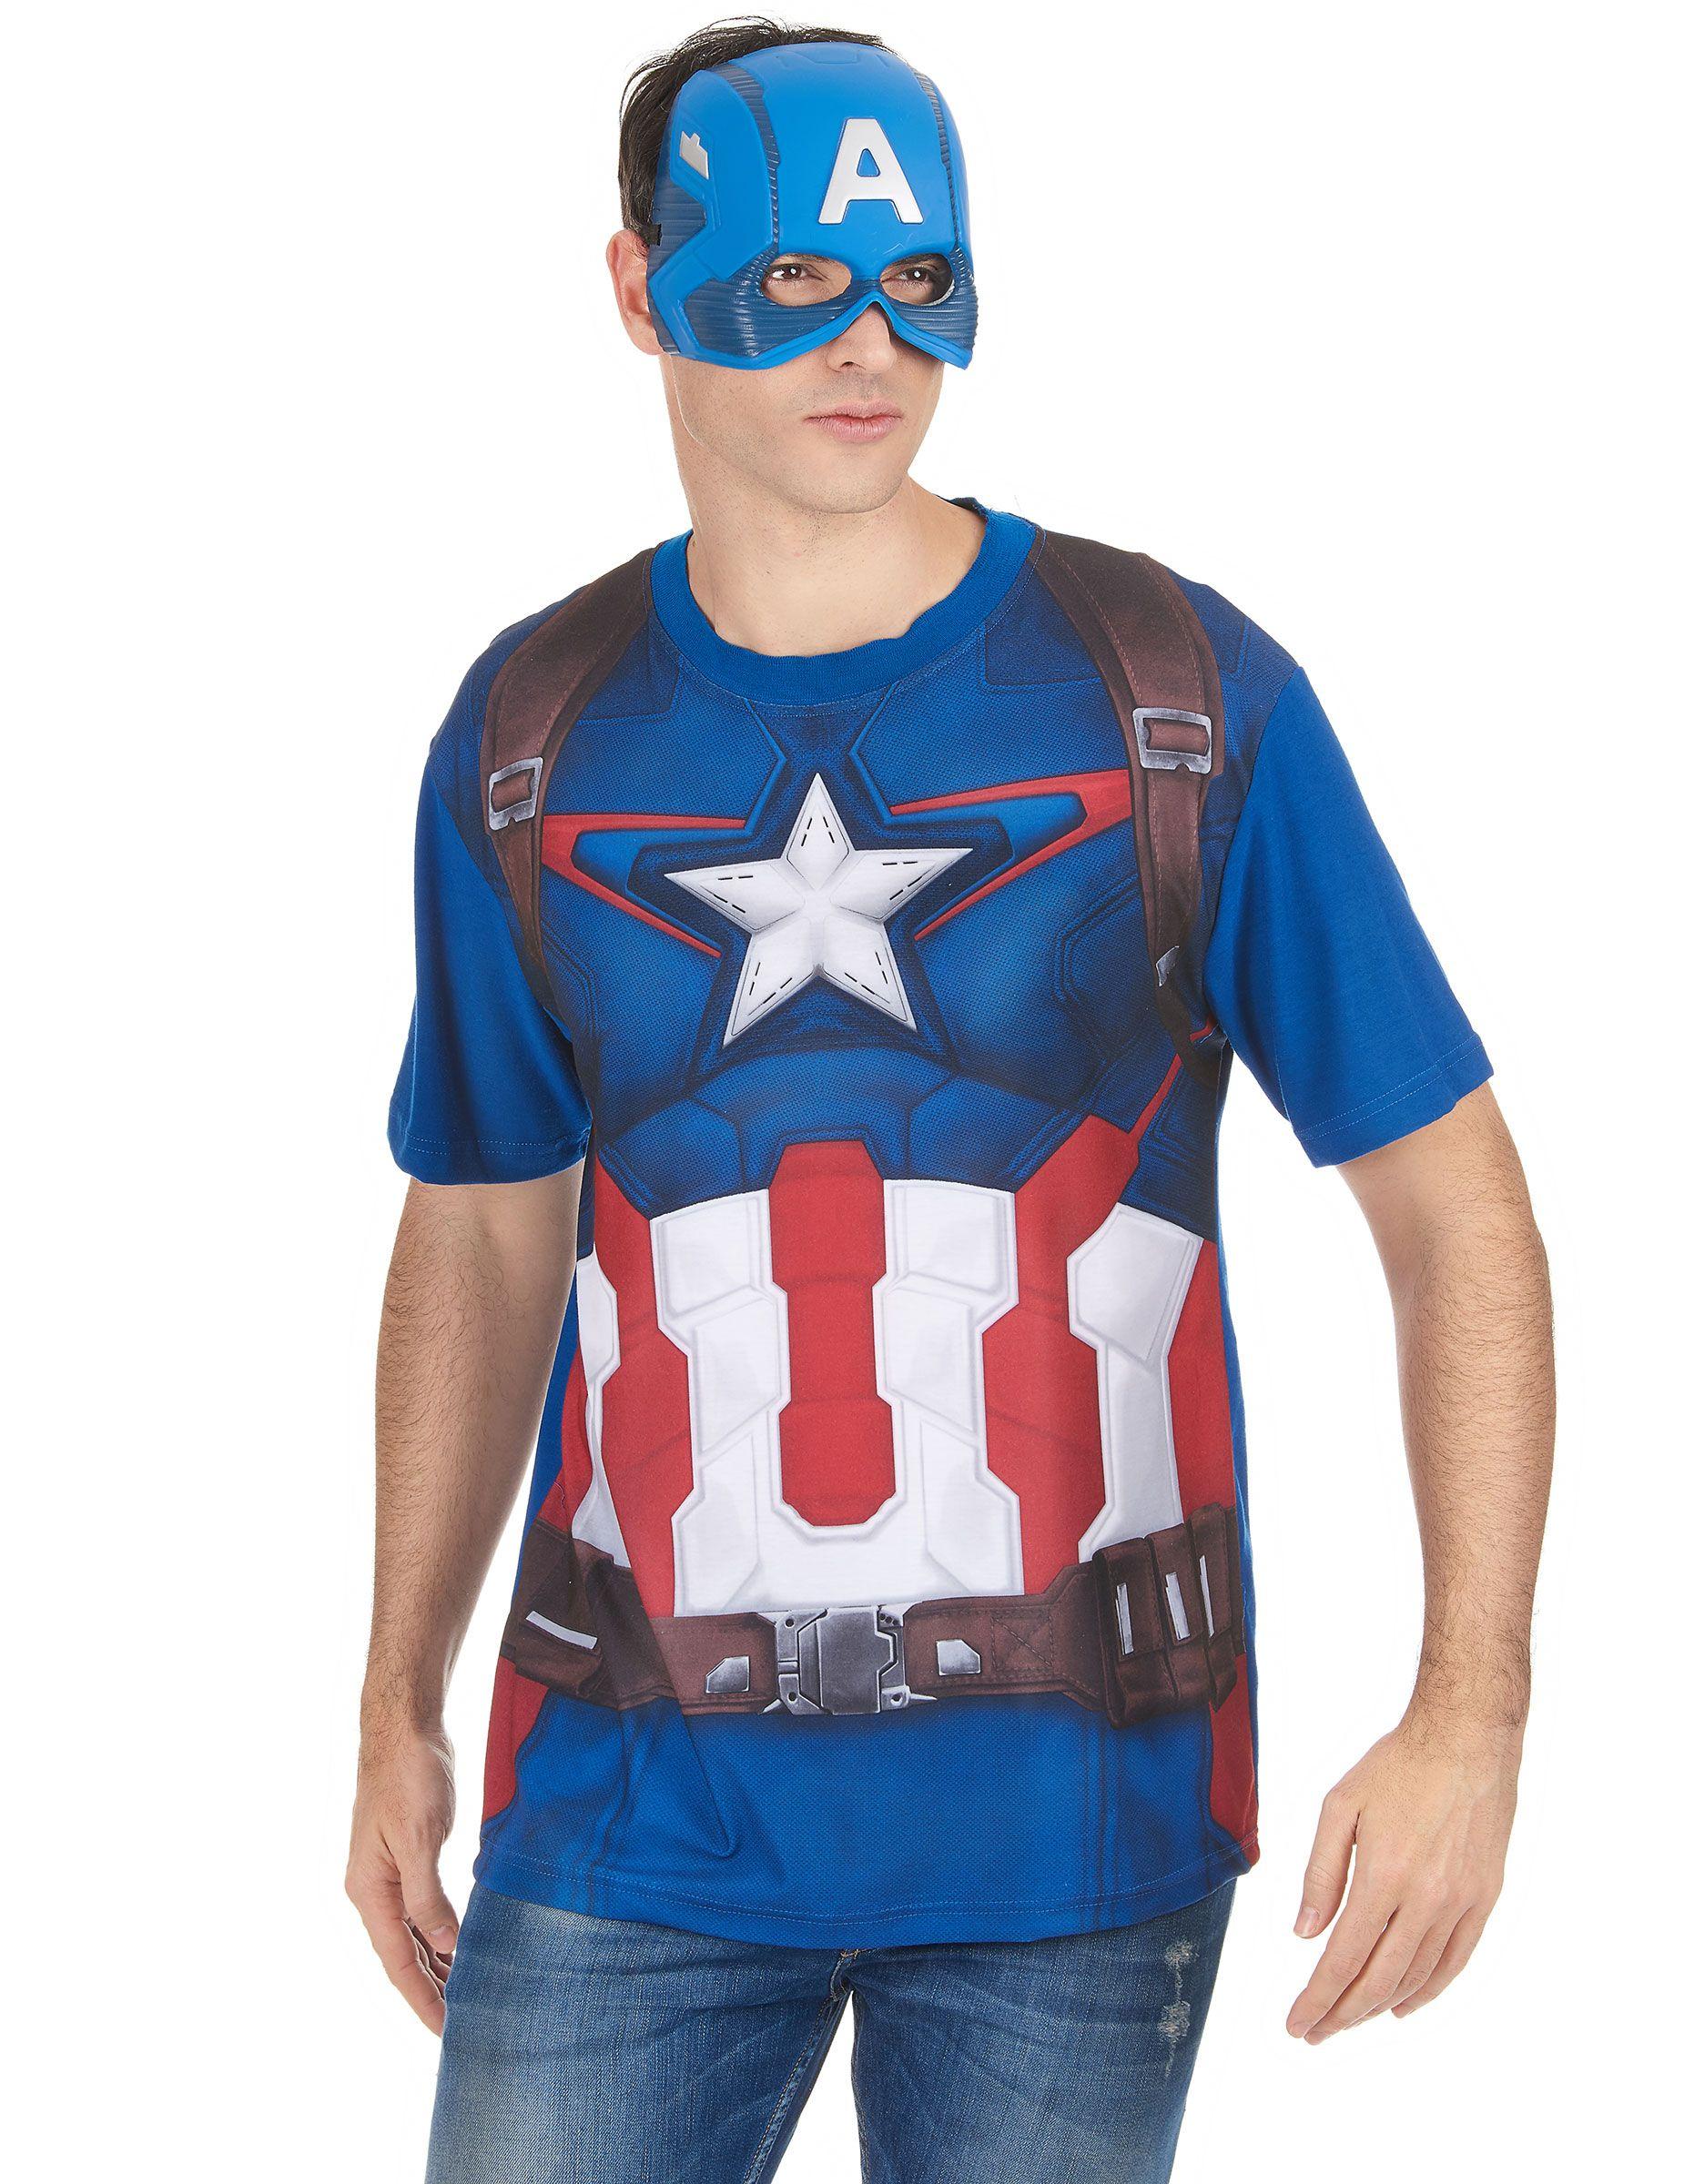 set aus t shirt und maske im captain america look. Black Bedroom Furniture Sets. Home Design Ideas